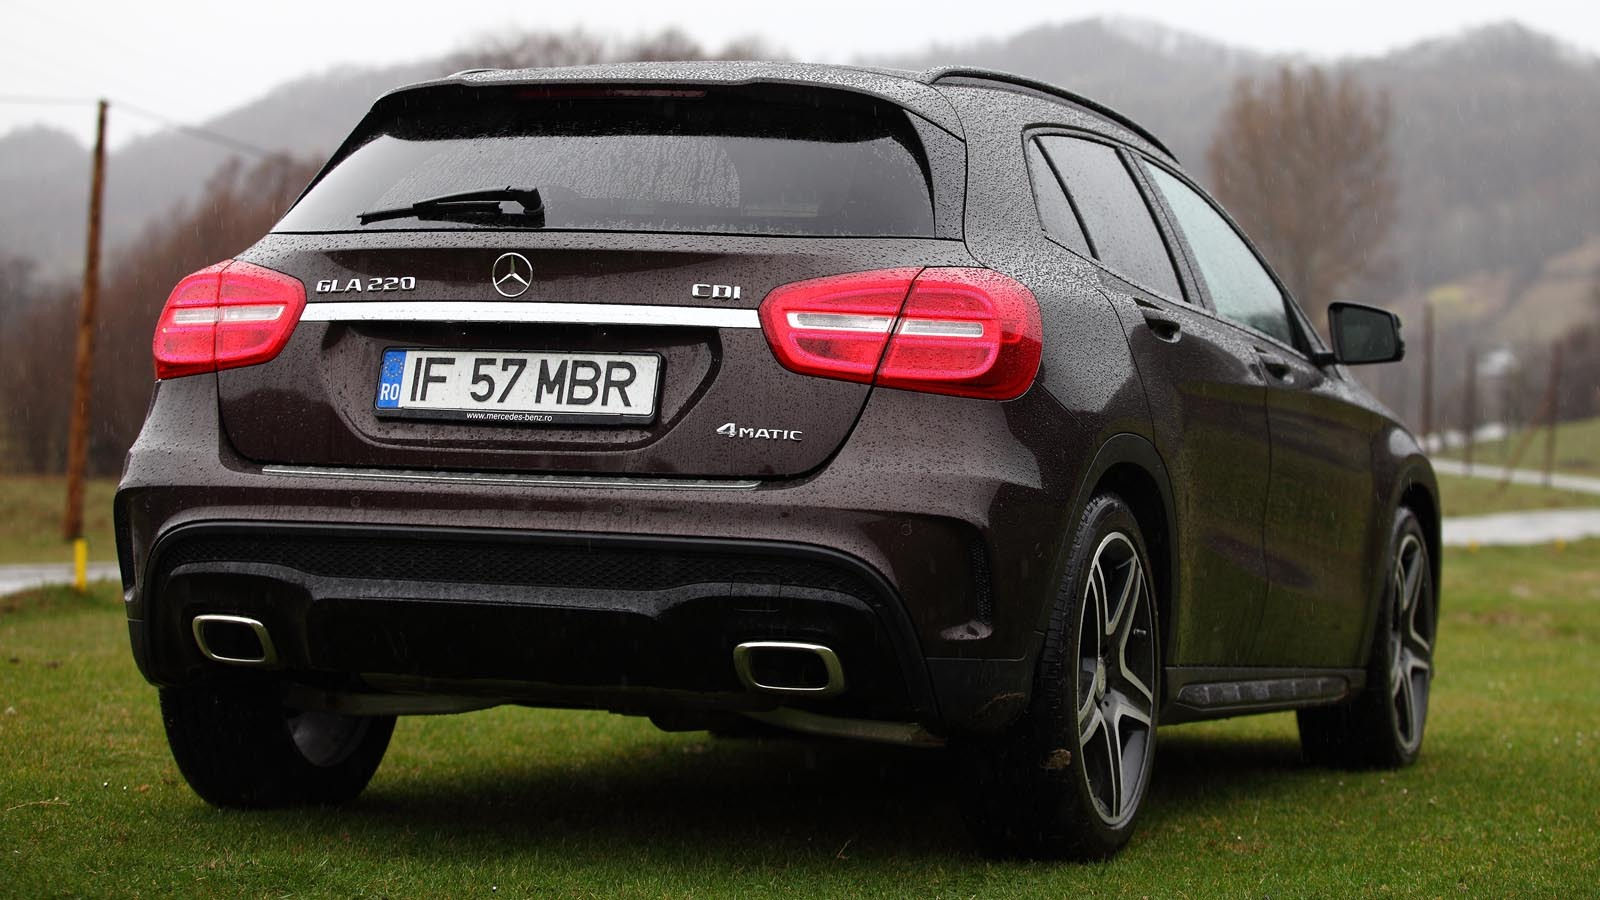 Test în România: Mercedes-Benz GLA 220 CDI 4MATIC. A-ul crossover